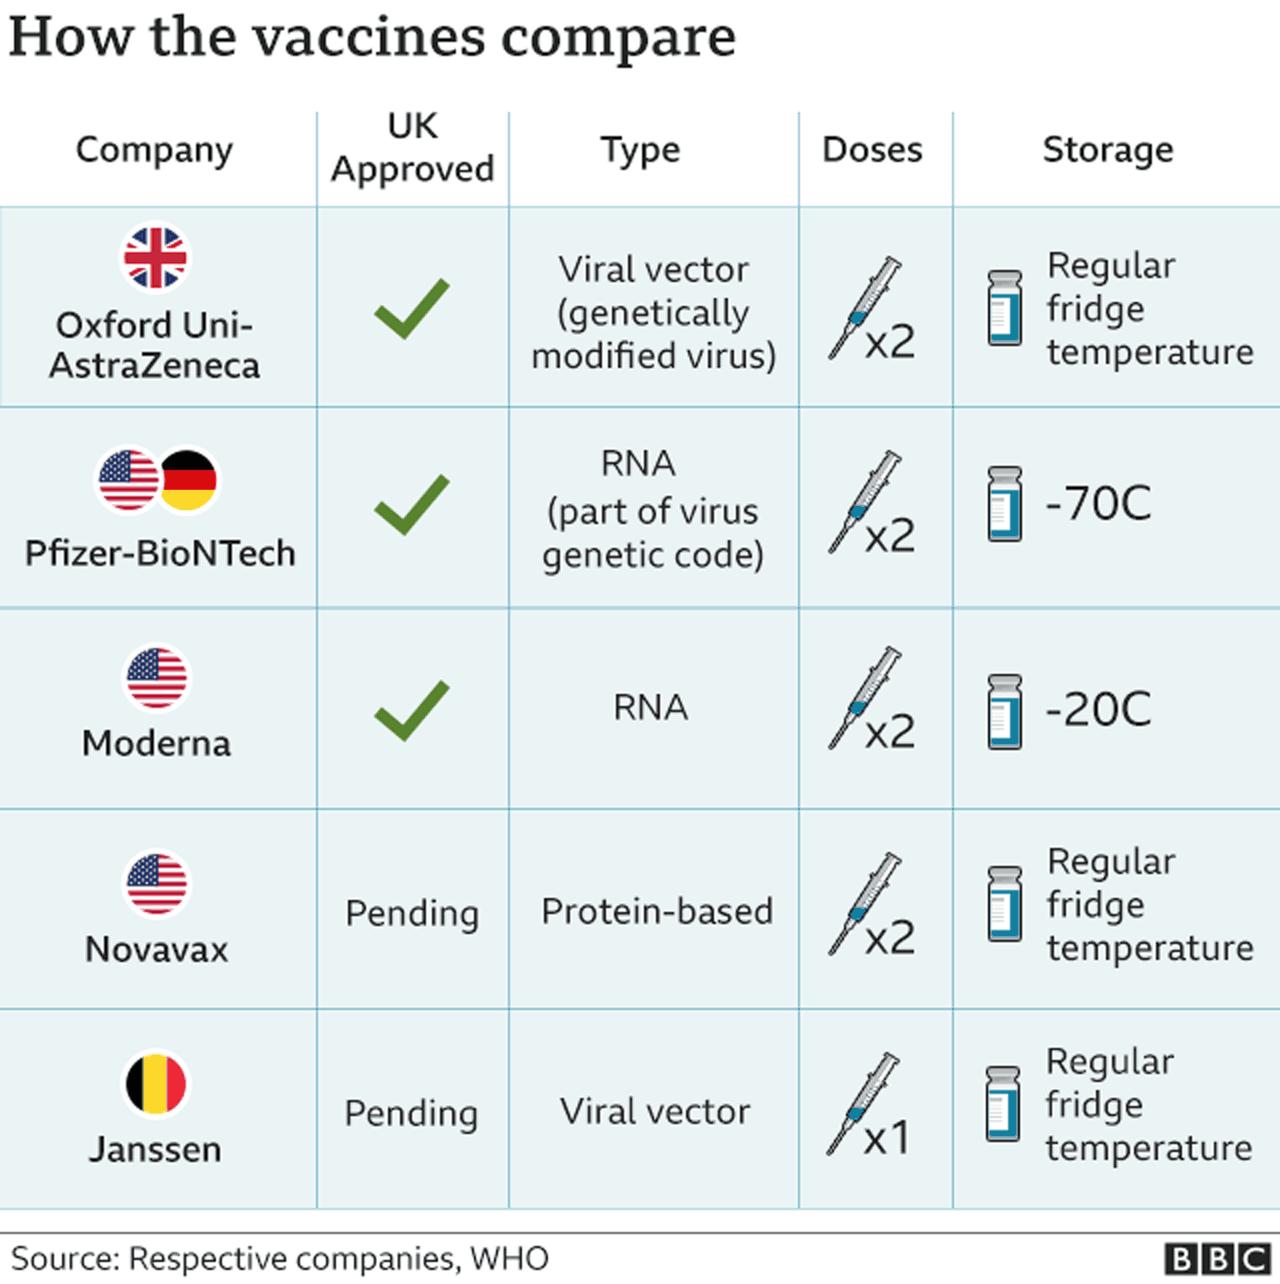 _116730964_vaccines_comparedincl_janssen_novavax_29_jan_640_2x-nc.png